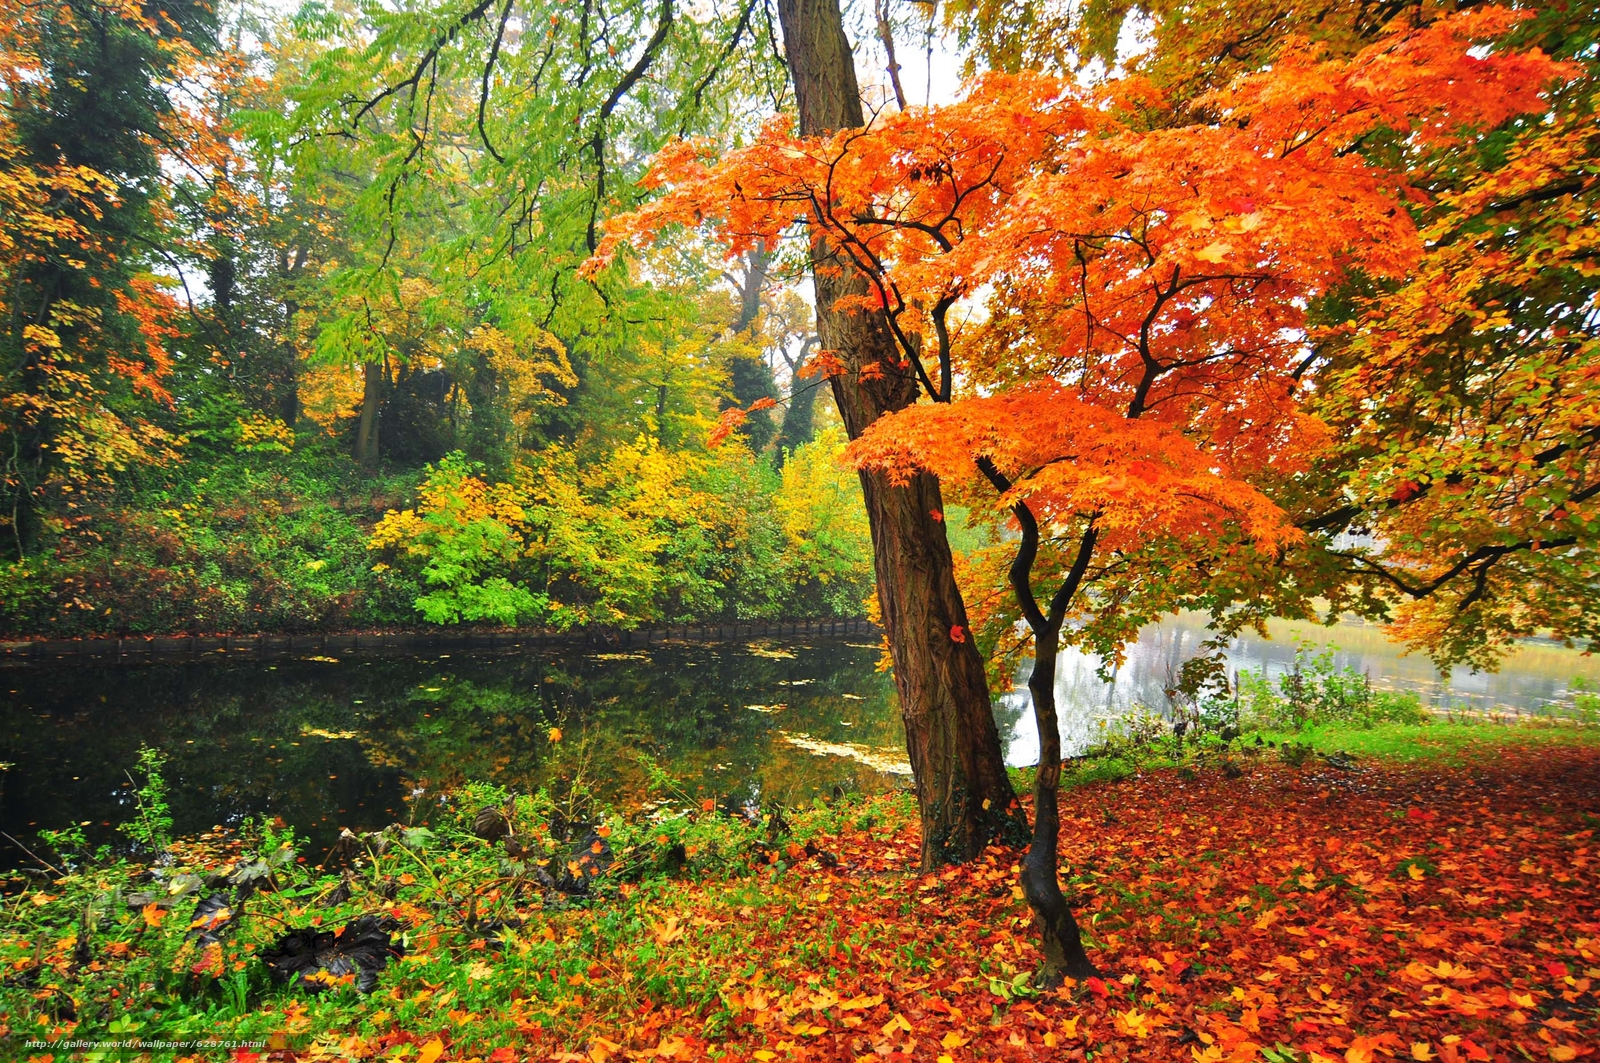 пруд, деревья, парк, пейзаж, осень